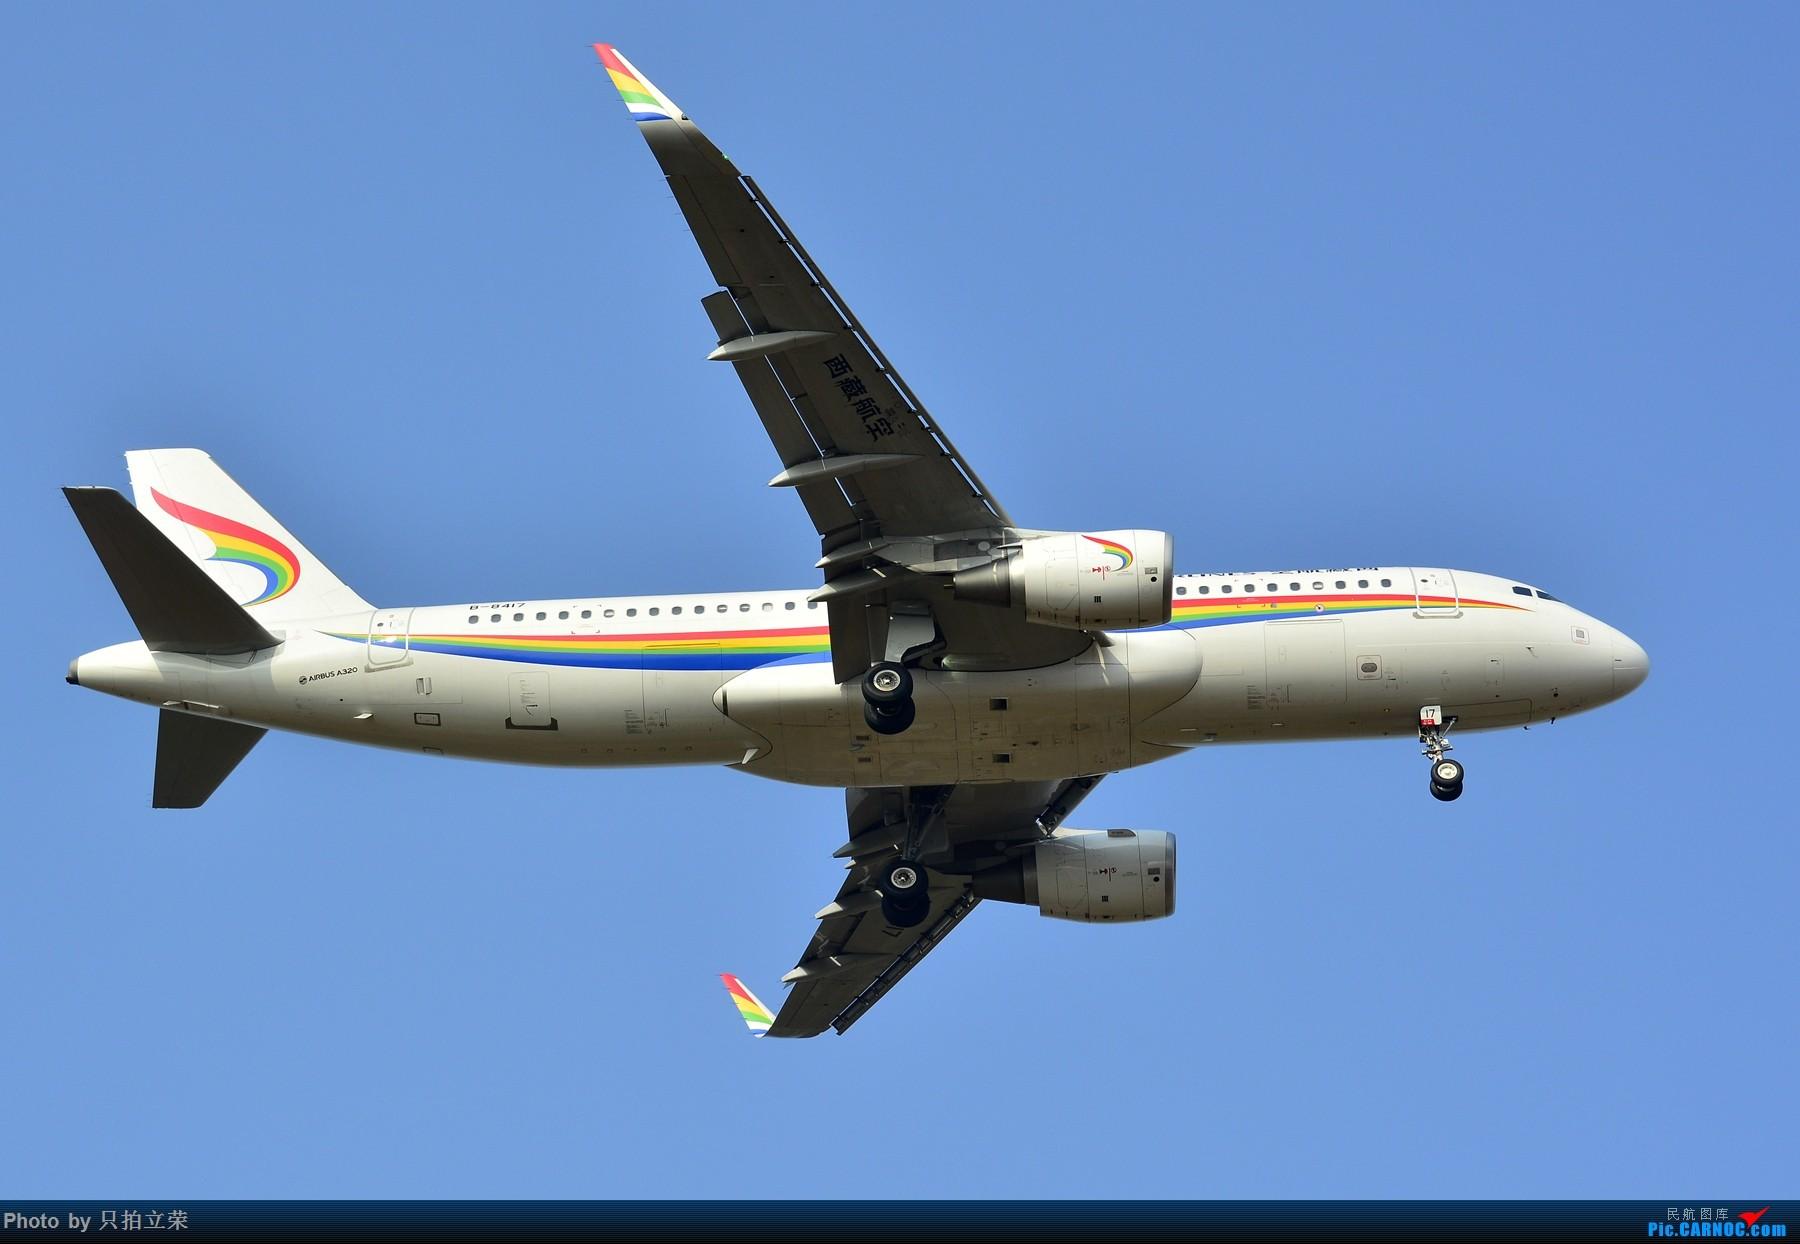 Re:[原创]湖南飞友会之10月9日长沙黄花好货满天飞! AIRBUS A320-200 B-8417 中国长沙黄花国际机场